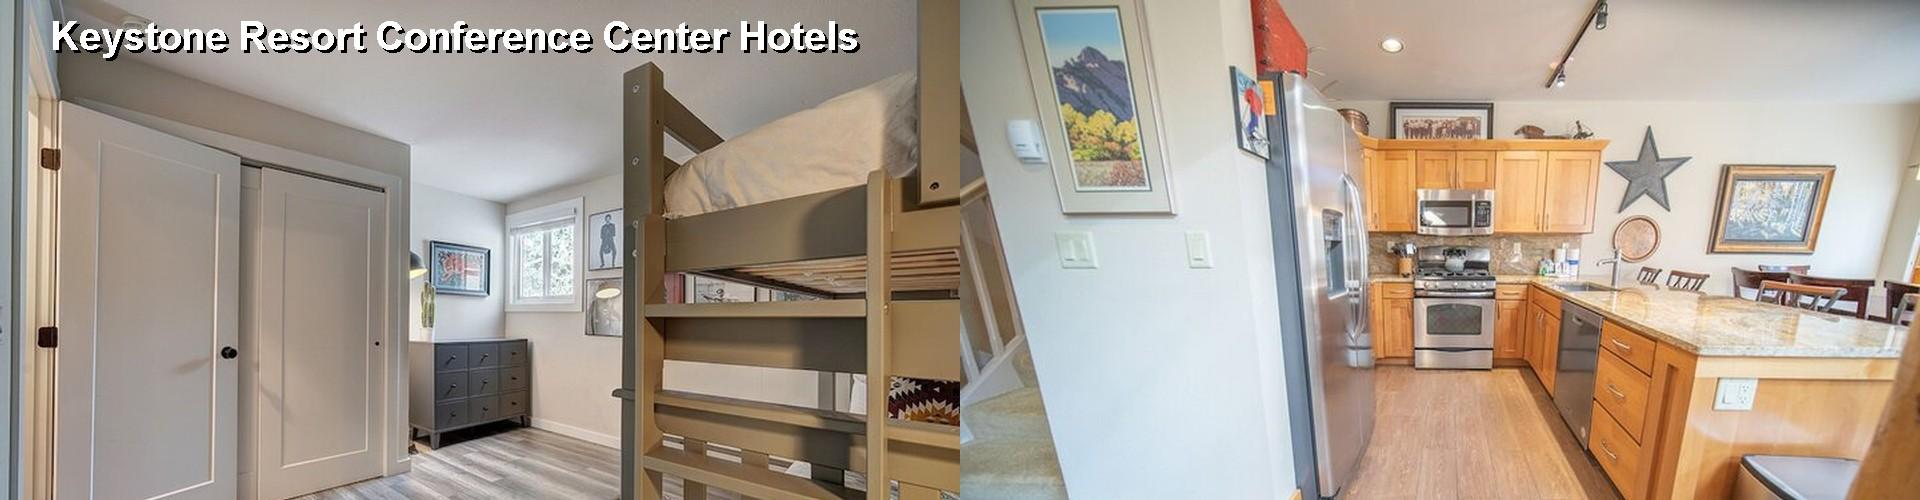 5 Best Hotels Near Keystone Resort Conference Center